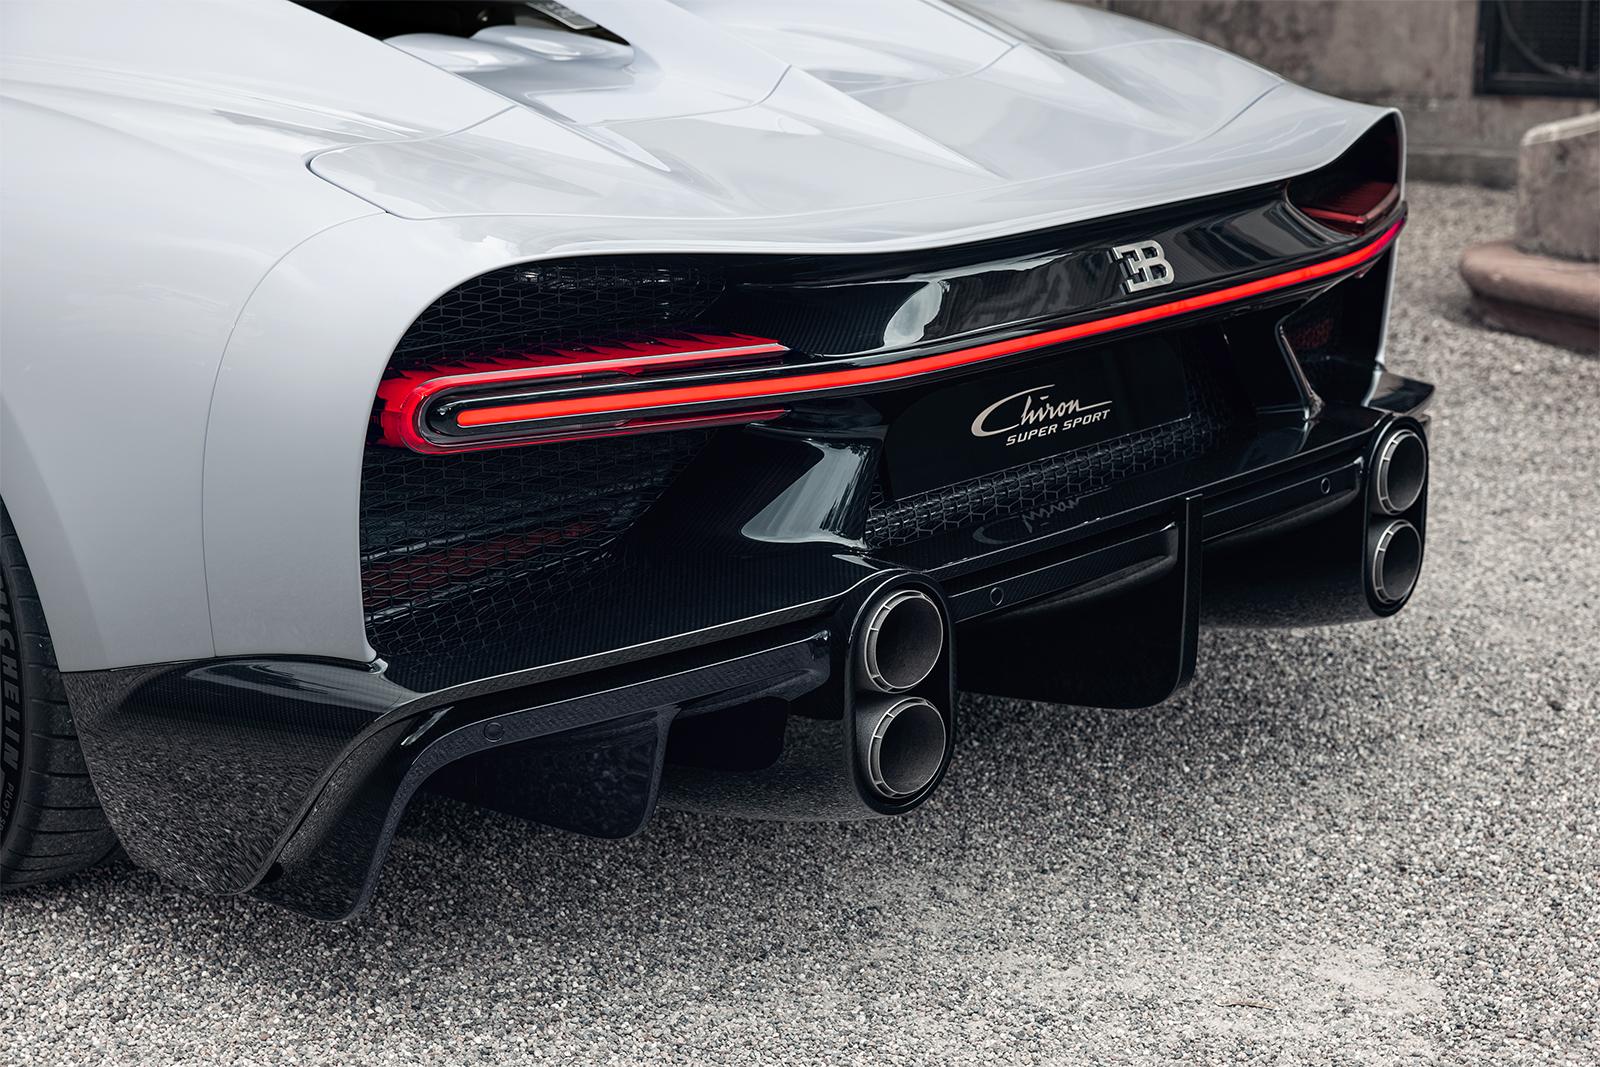 03-06_bugatti_chiron_super_sport_molsheim_rear_close-up.jpeg